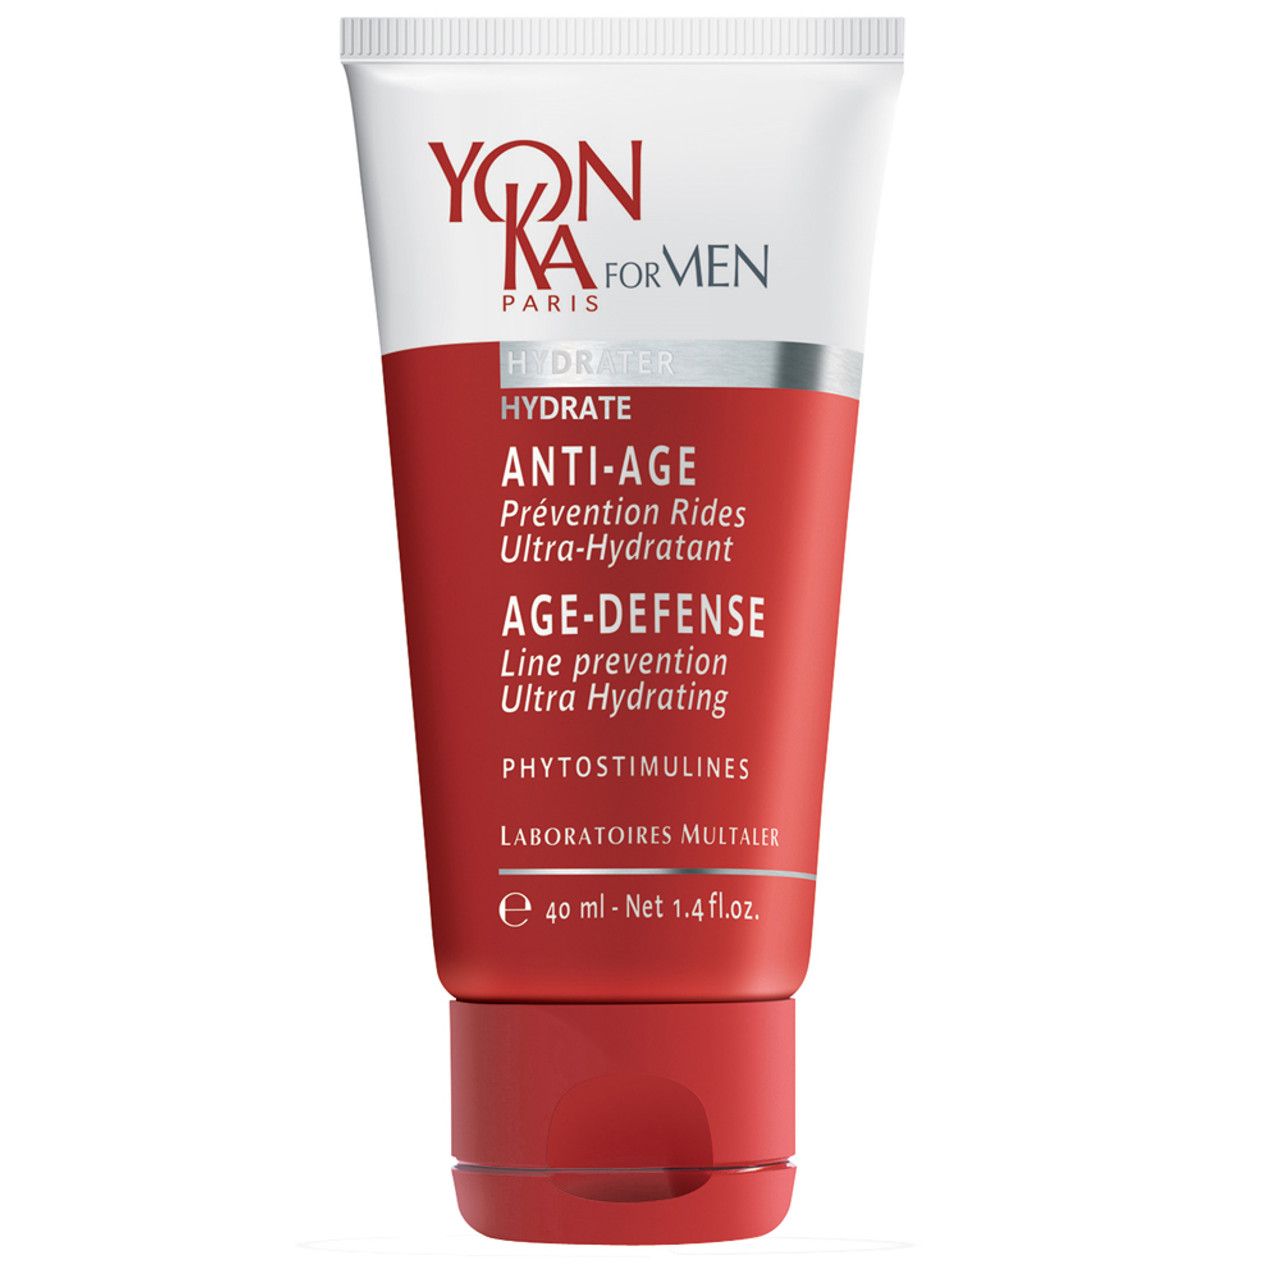 YonKa Age Defense for Men